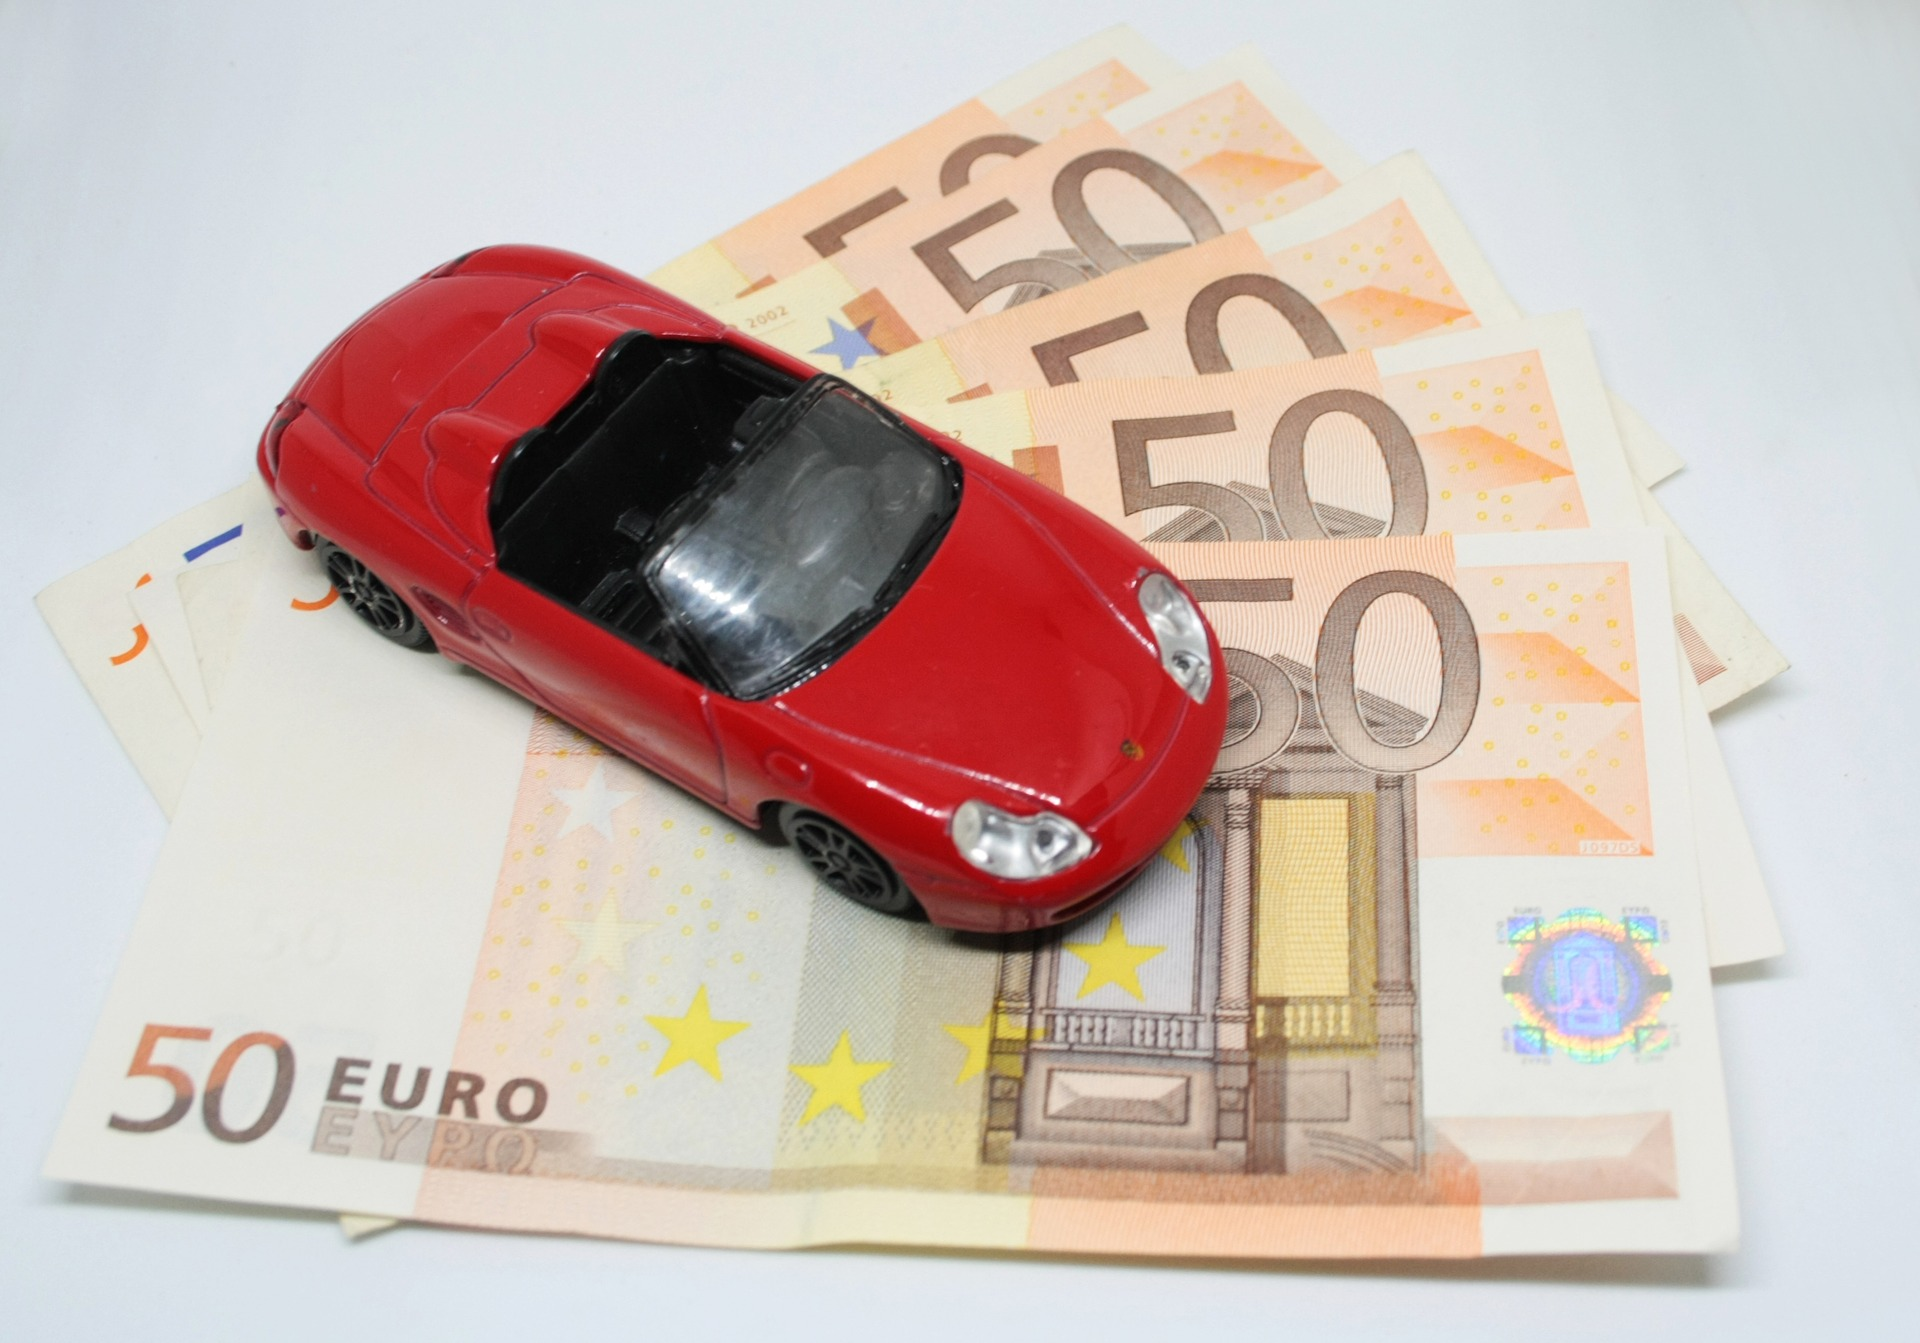 Musterklage Gegen Vw Bank Mercedes Bank Der Widerrufsjoker Greift